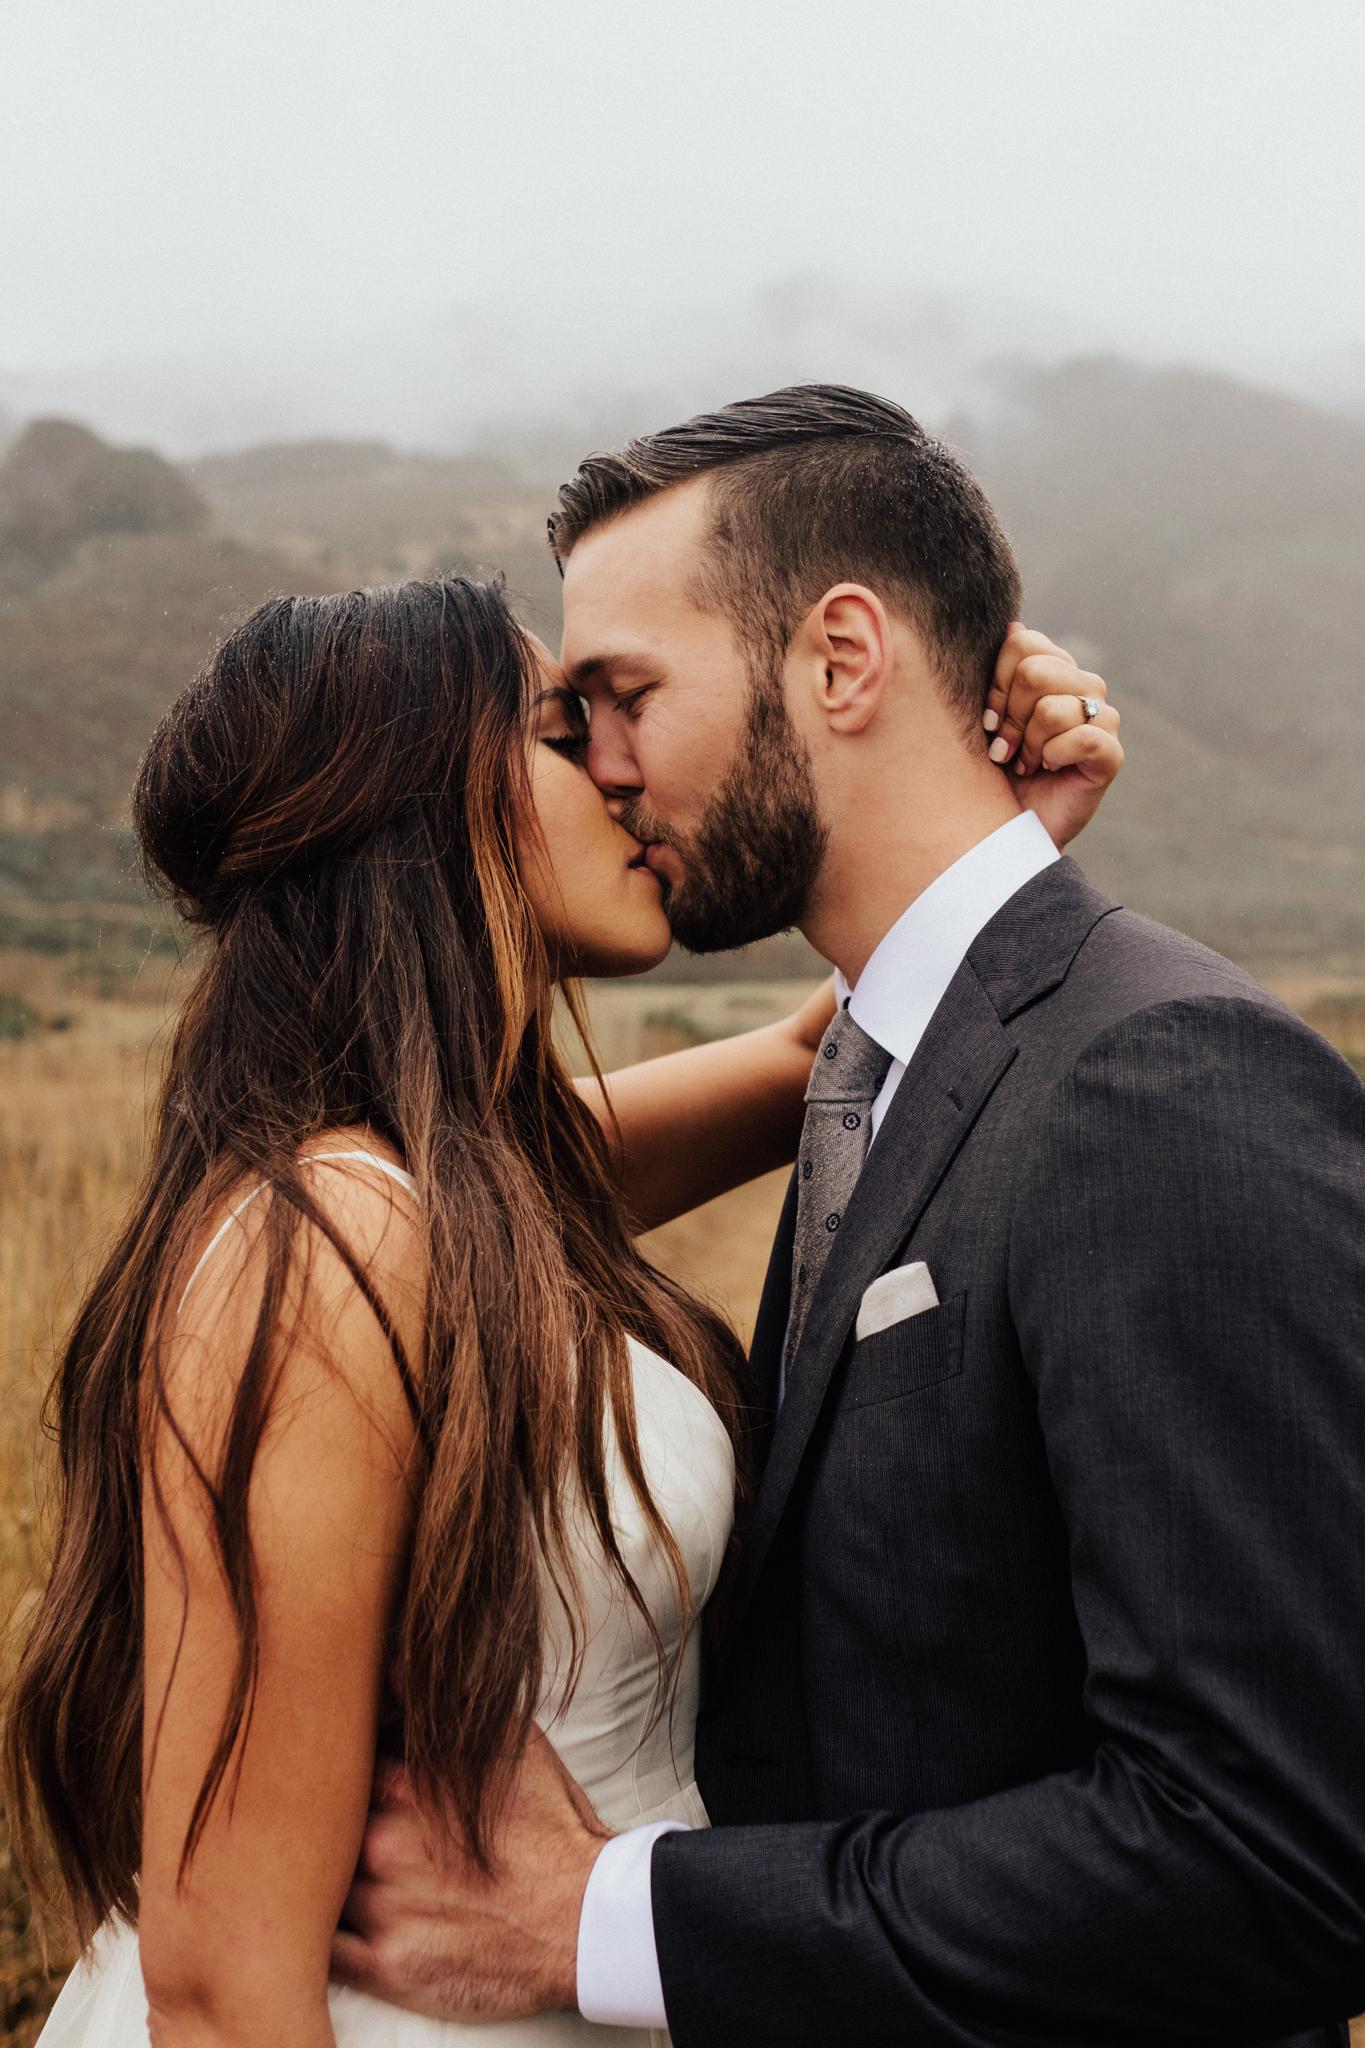 Arizona-Adventure-Elopement-Wedding-Photographer-30.jpg